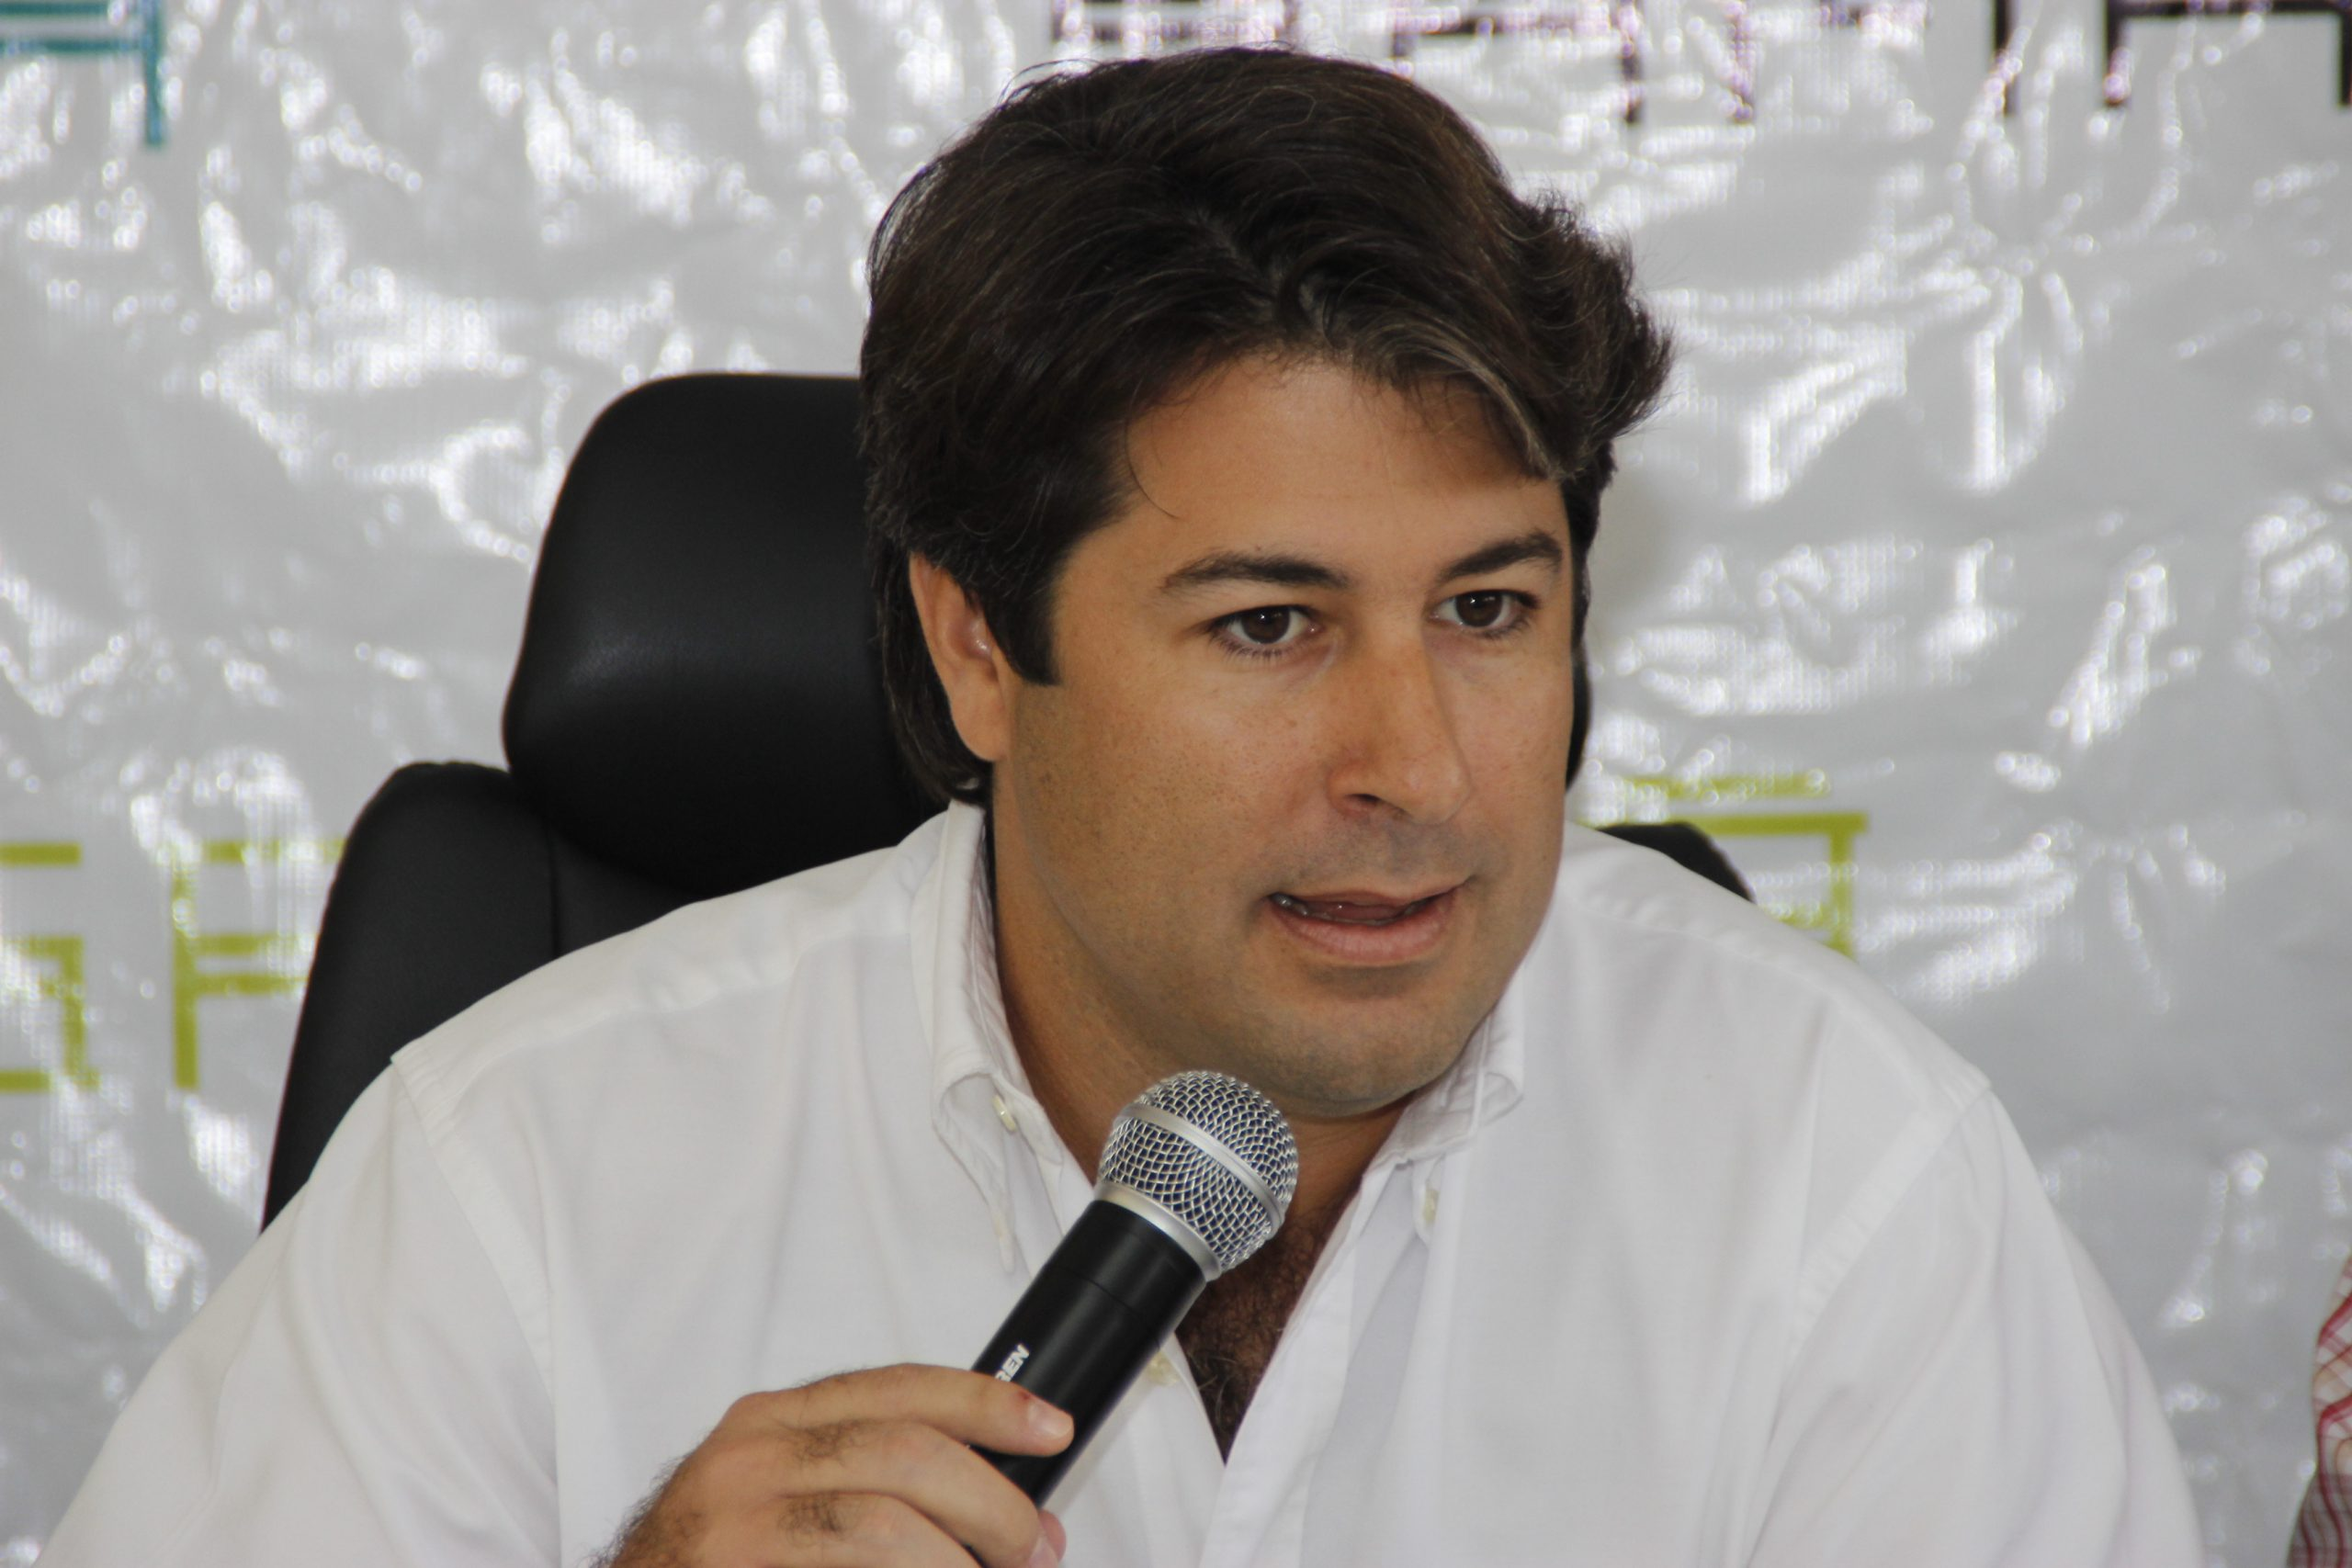 Presidente de Asonahores dice sector turístico no contempla flexibilizar protocolos contra covid